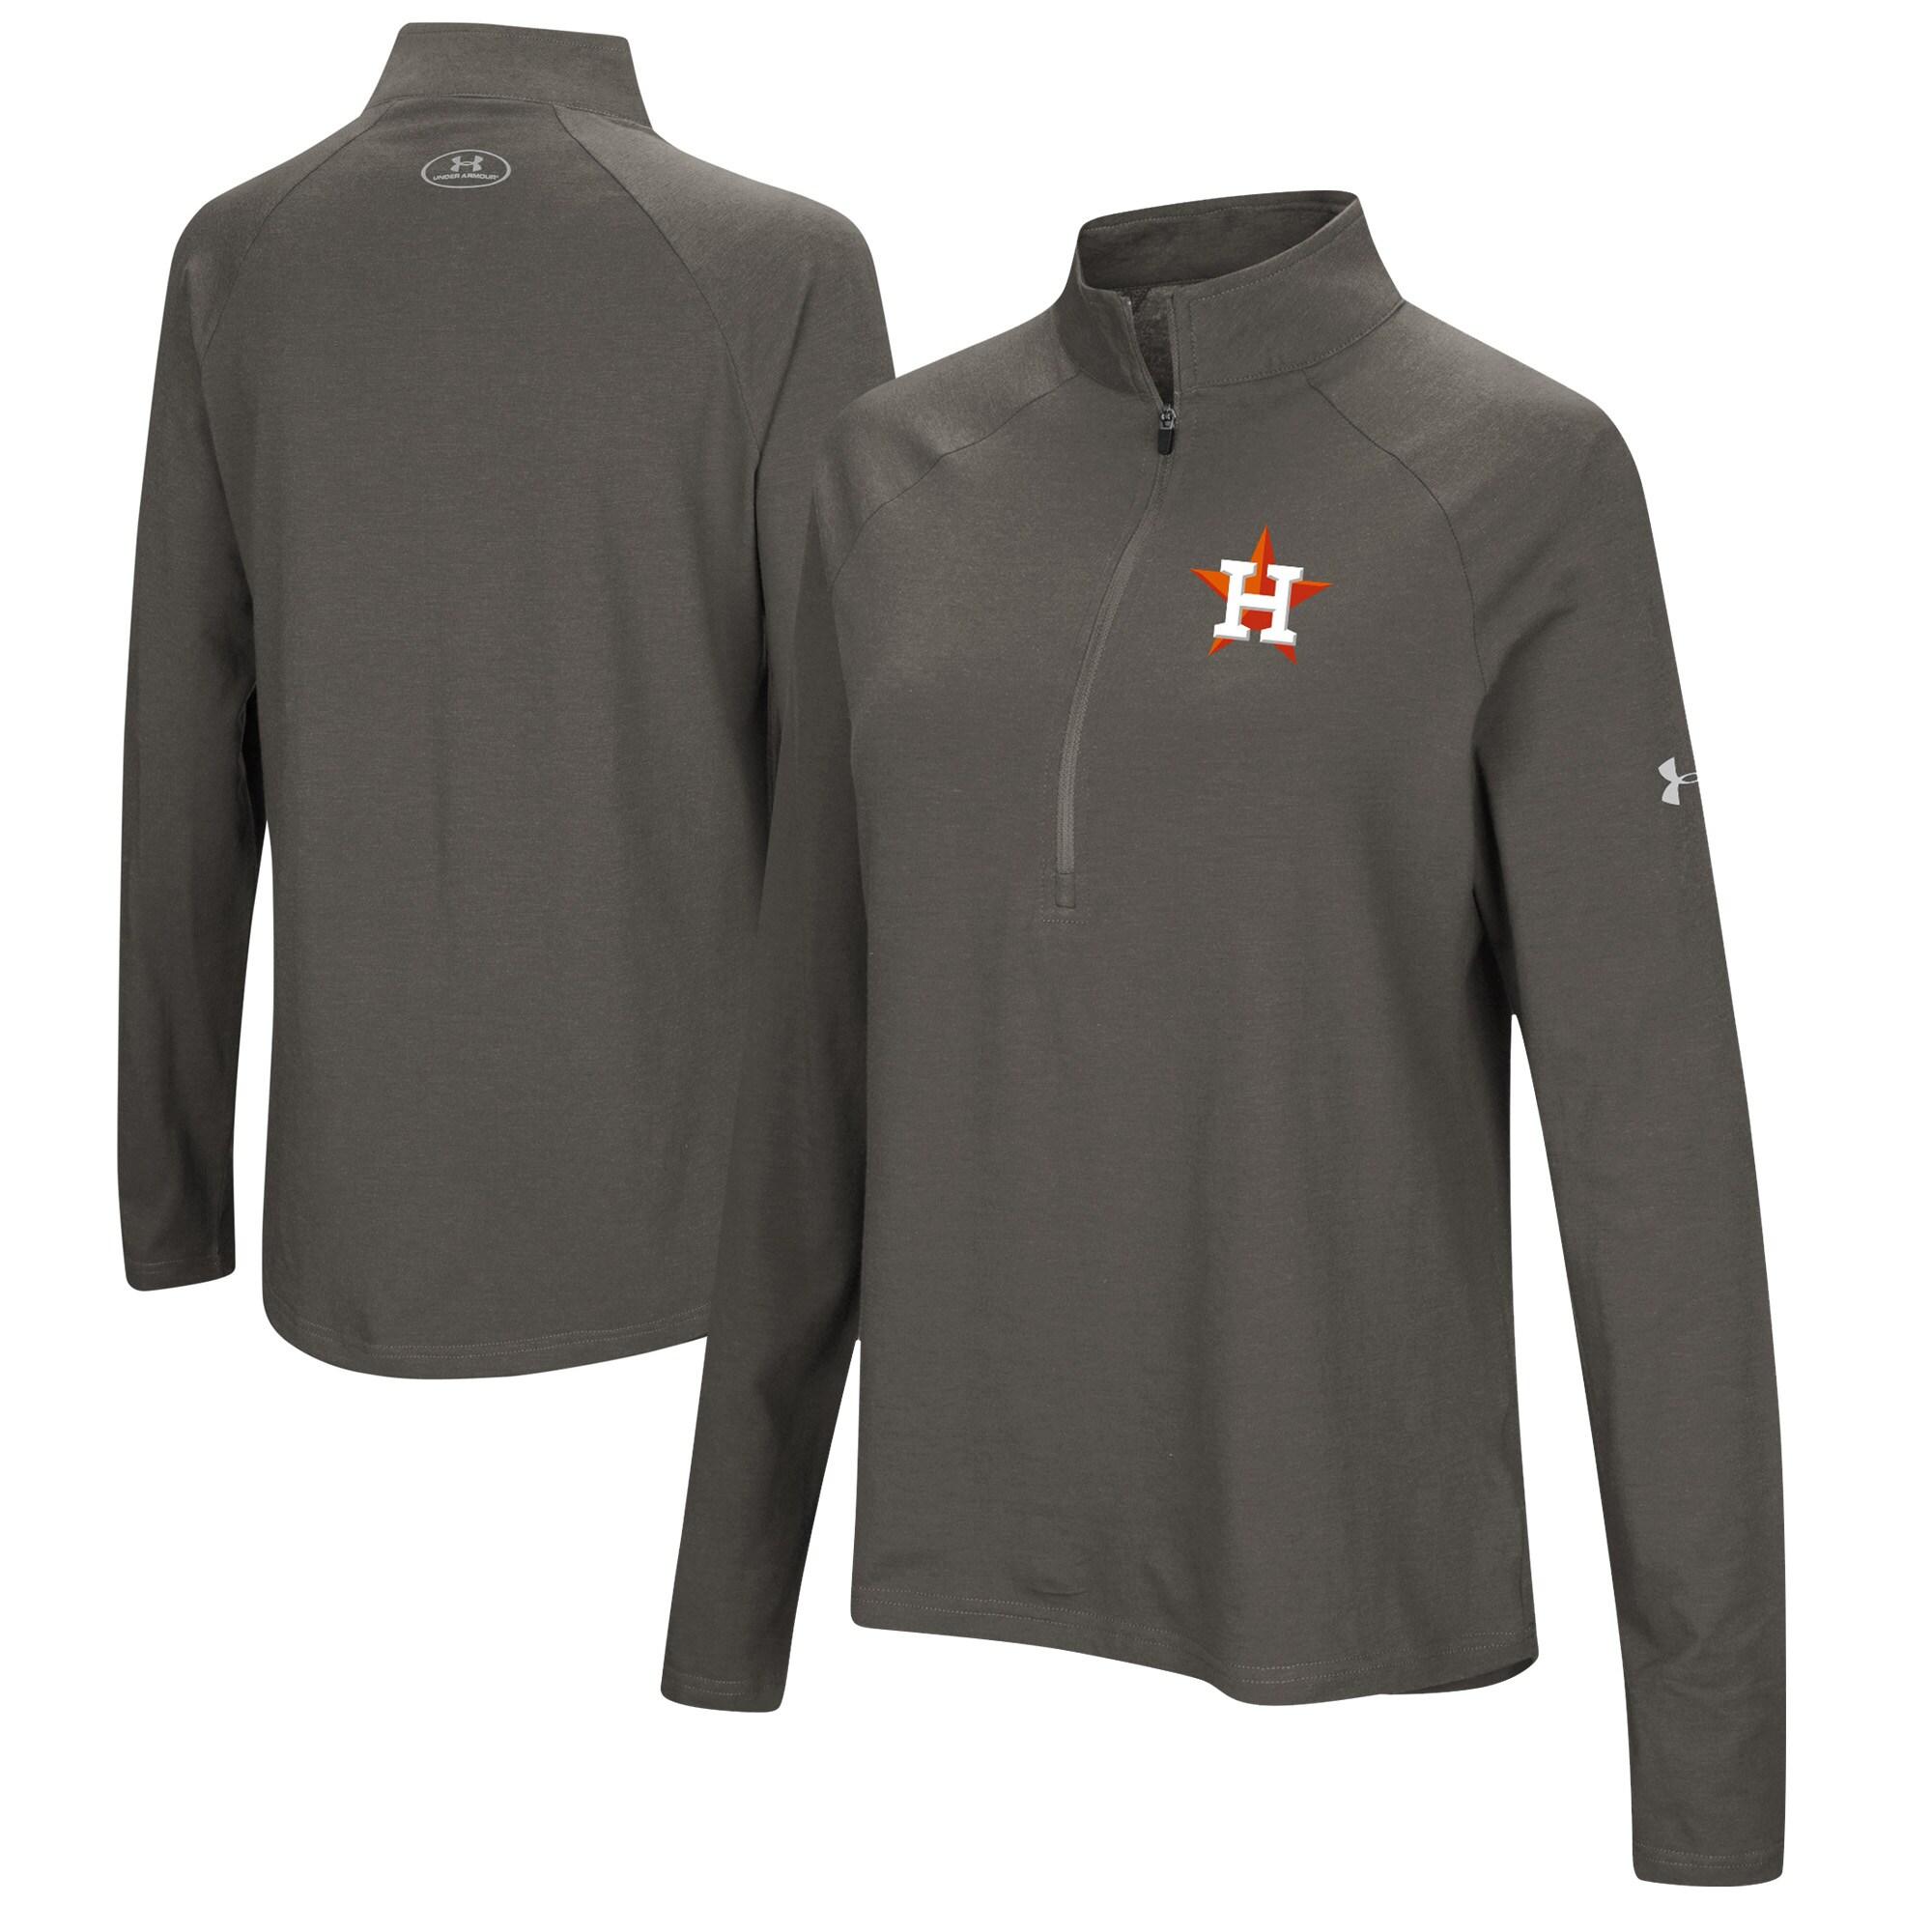 Houston Astros Under Armour Women's Passion Performance Tri-Blend Raglan Half-Zip Pullover Jacket - Heathered Gray